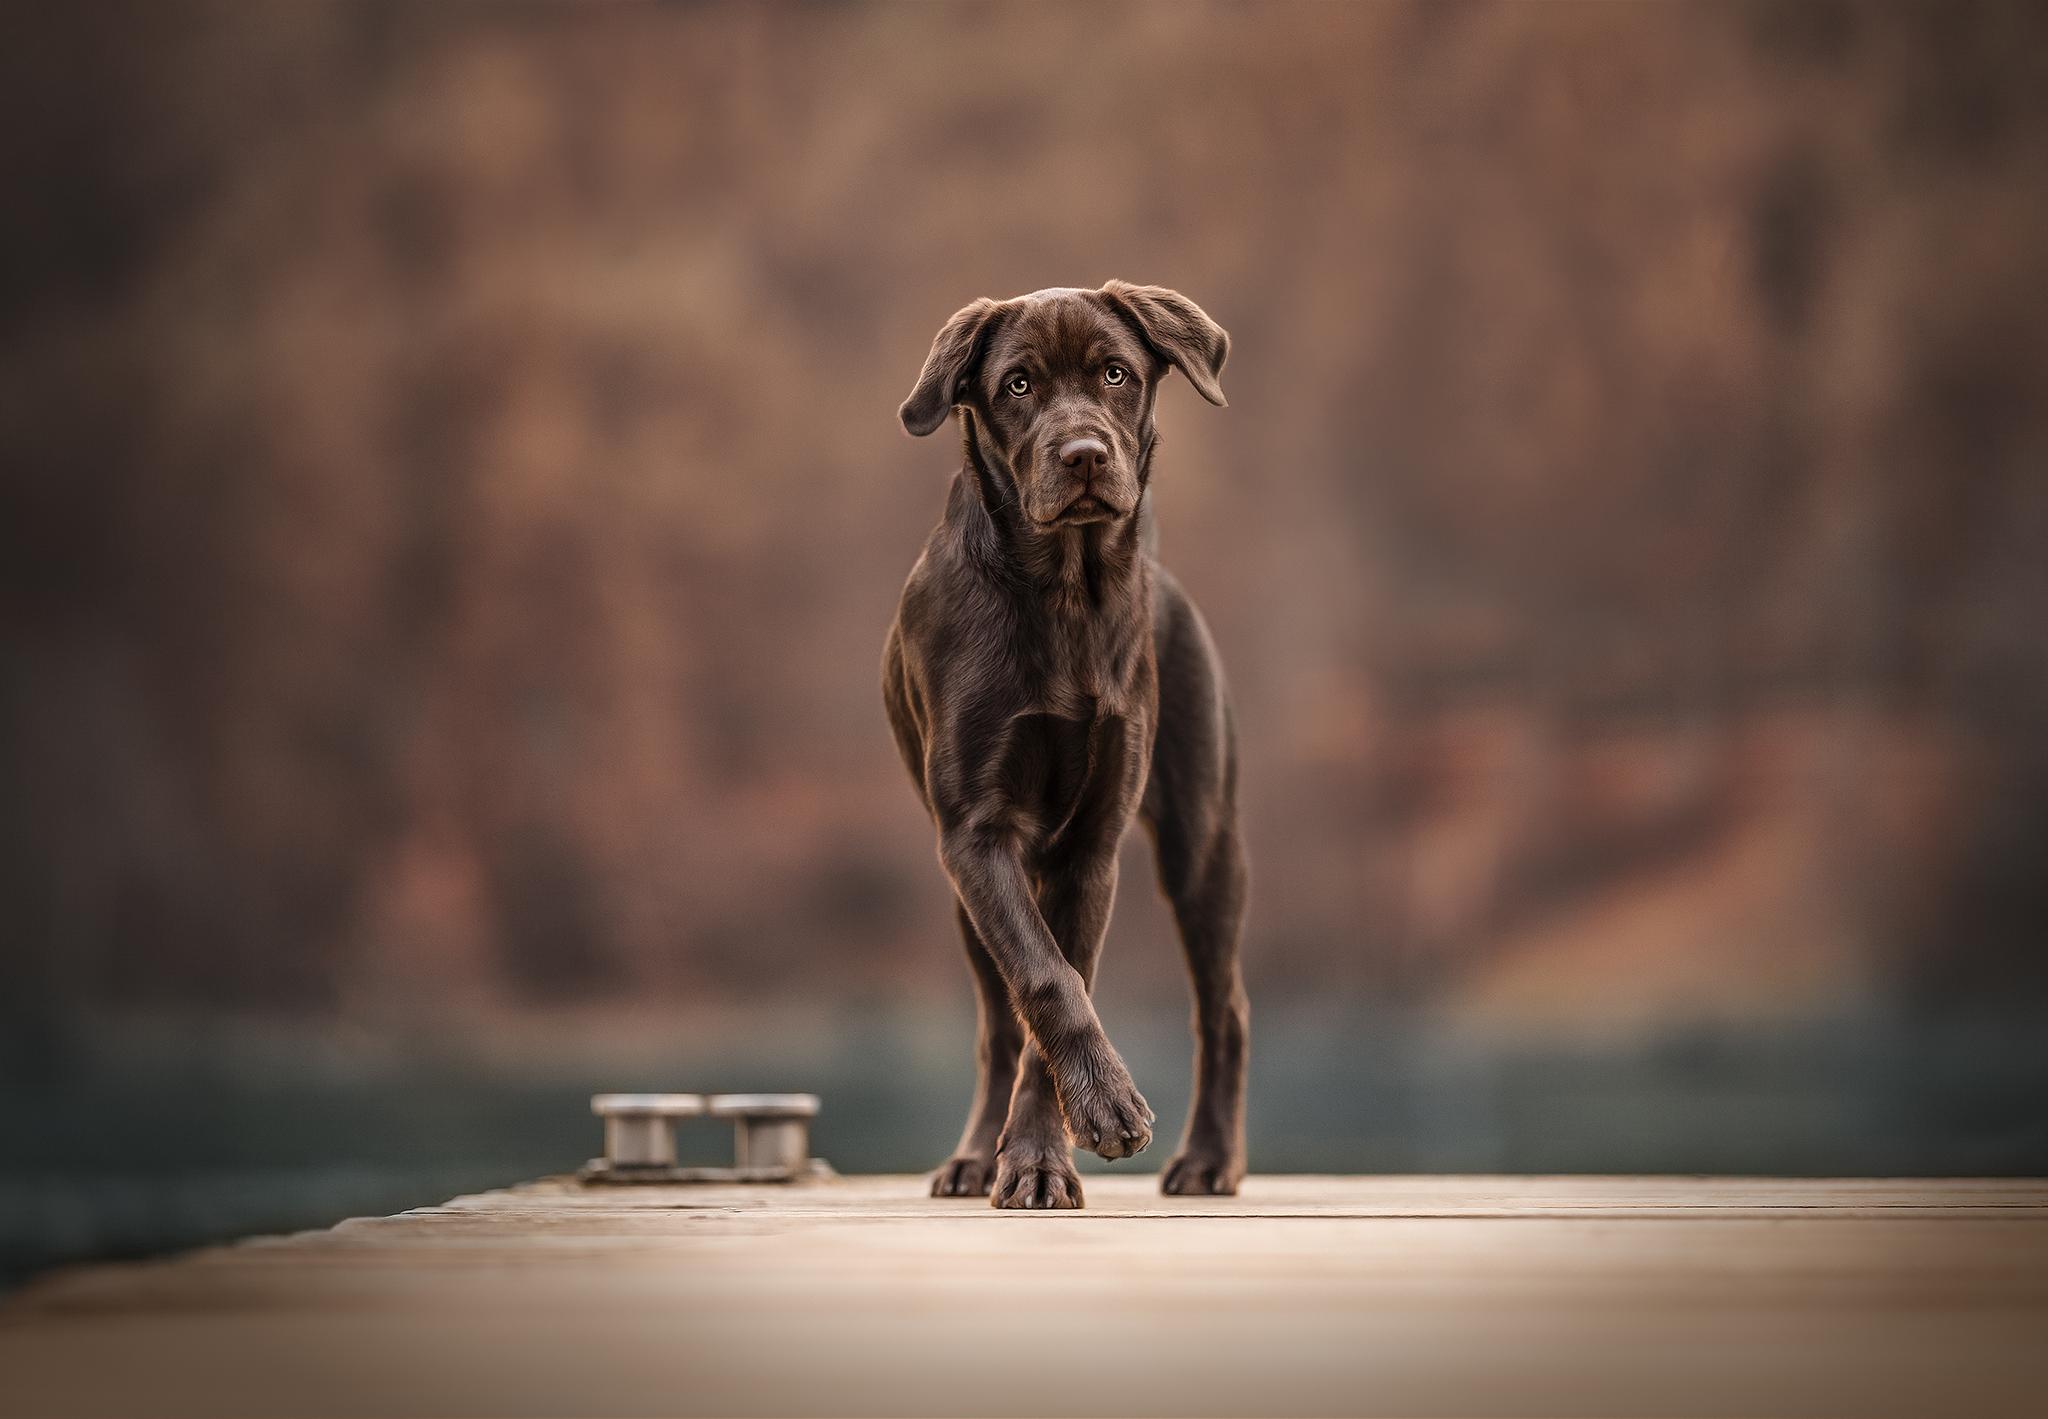 labrador, hundefoto, hundefotoshooting, hundefotografie,brauner labbi, schokoladen labrador, odenwald, hessen, lützelbach